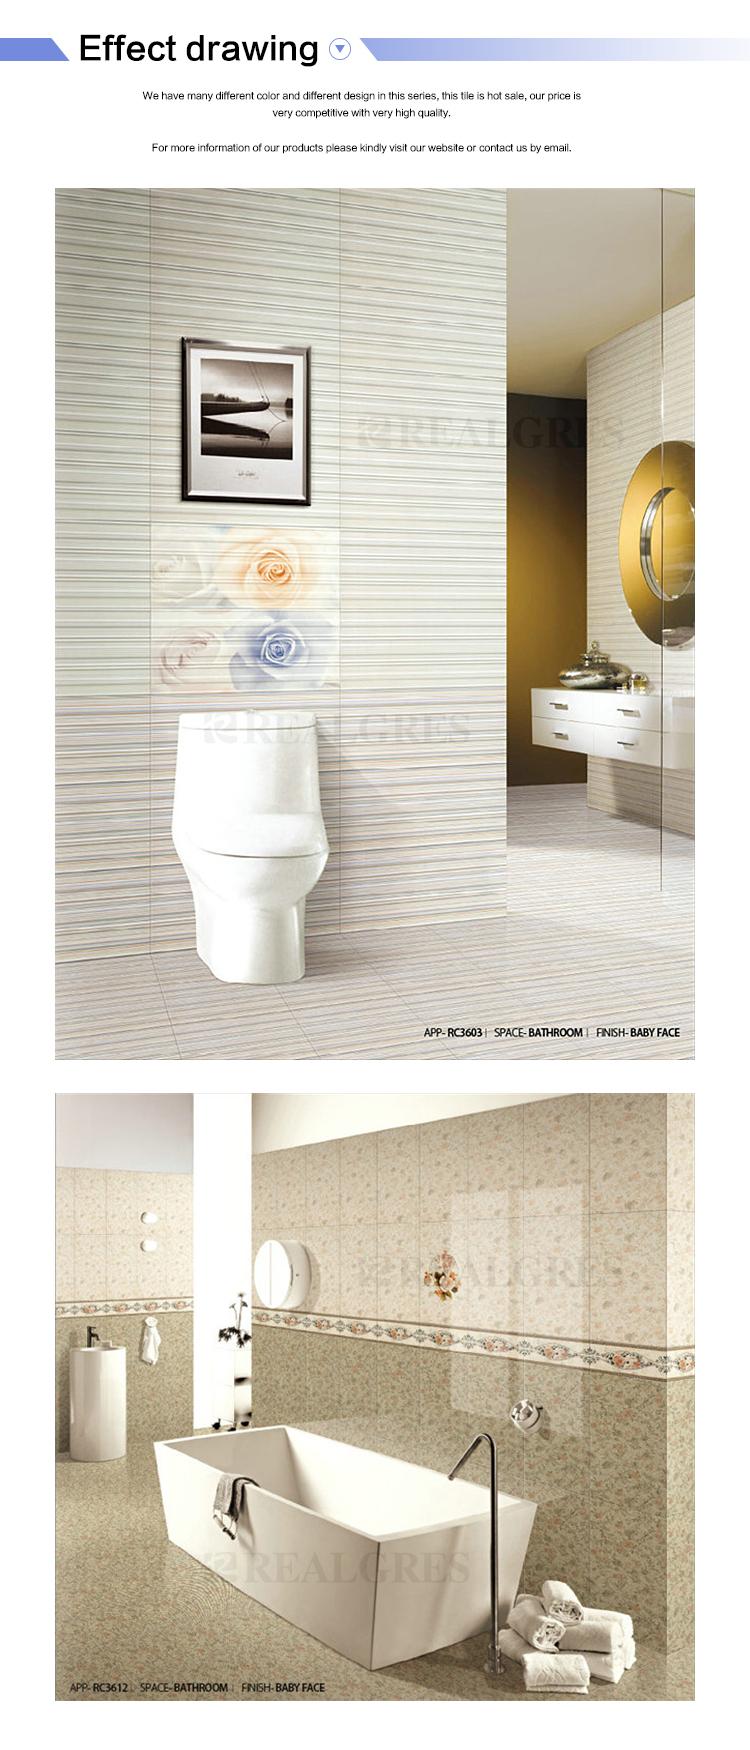 Bathroom Names: 2017 Unique Style Contemporary Ceramic Glazed Names Of